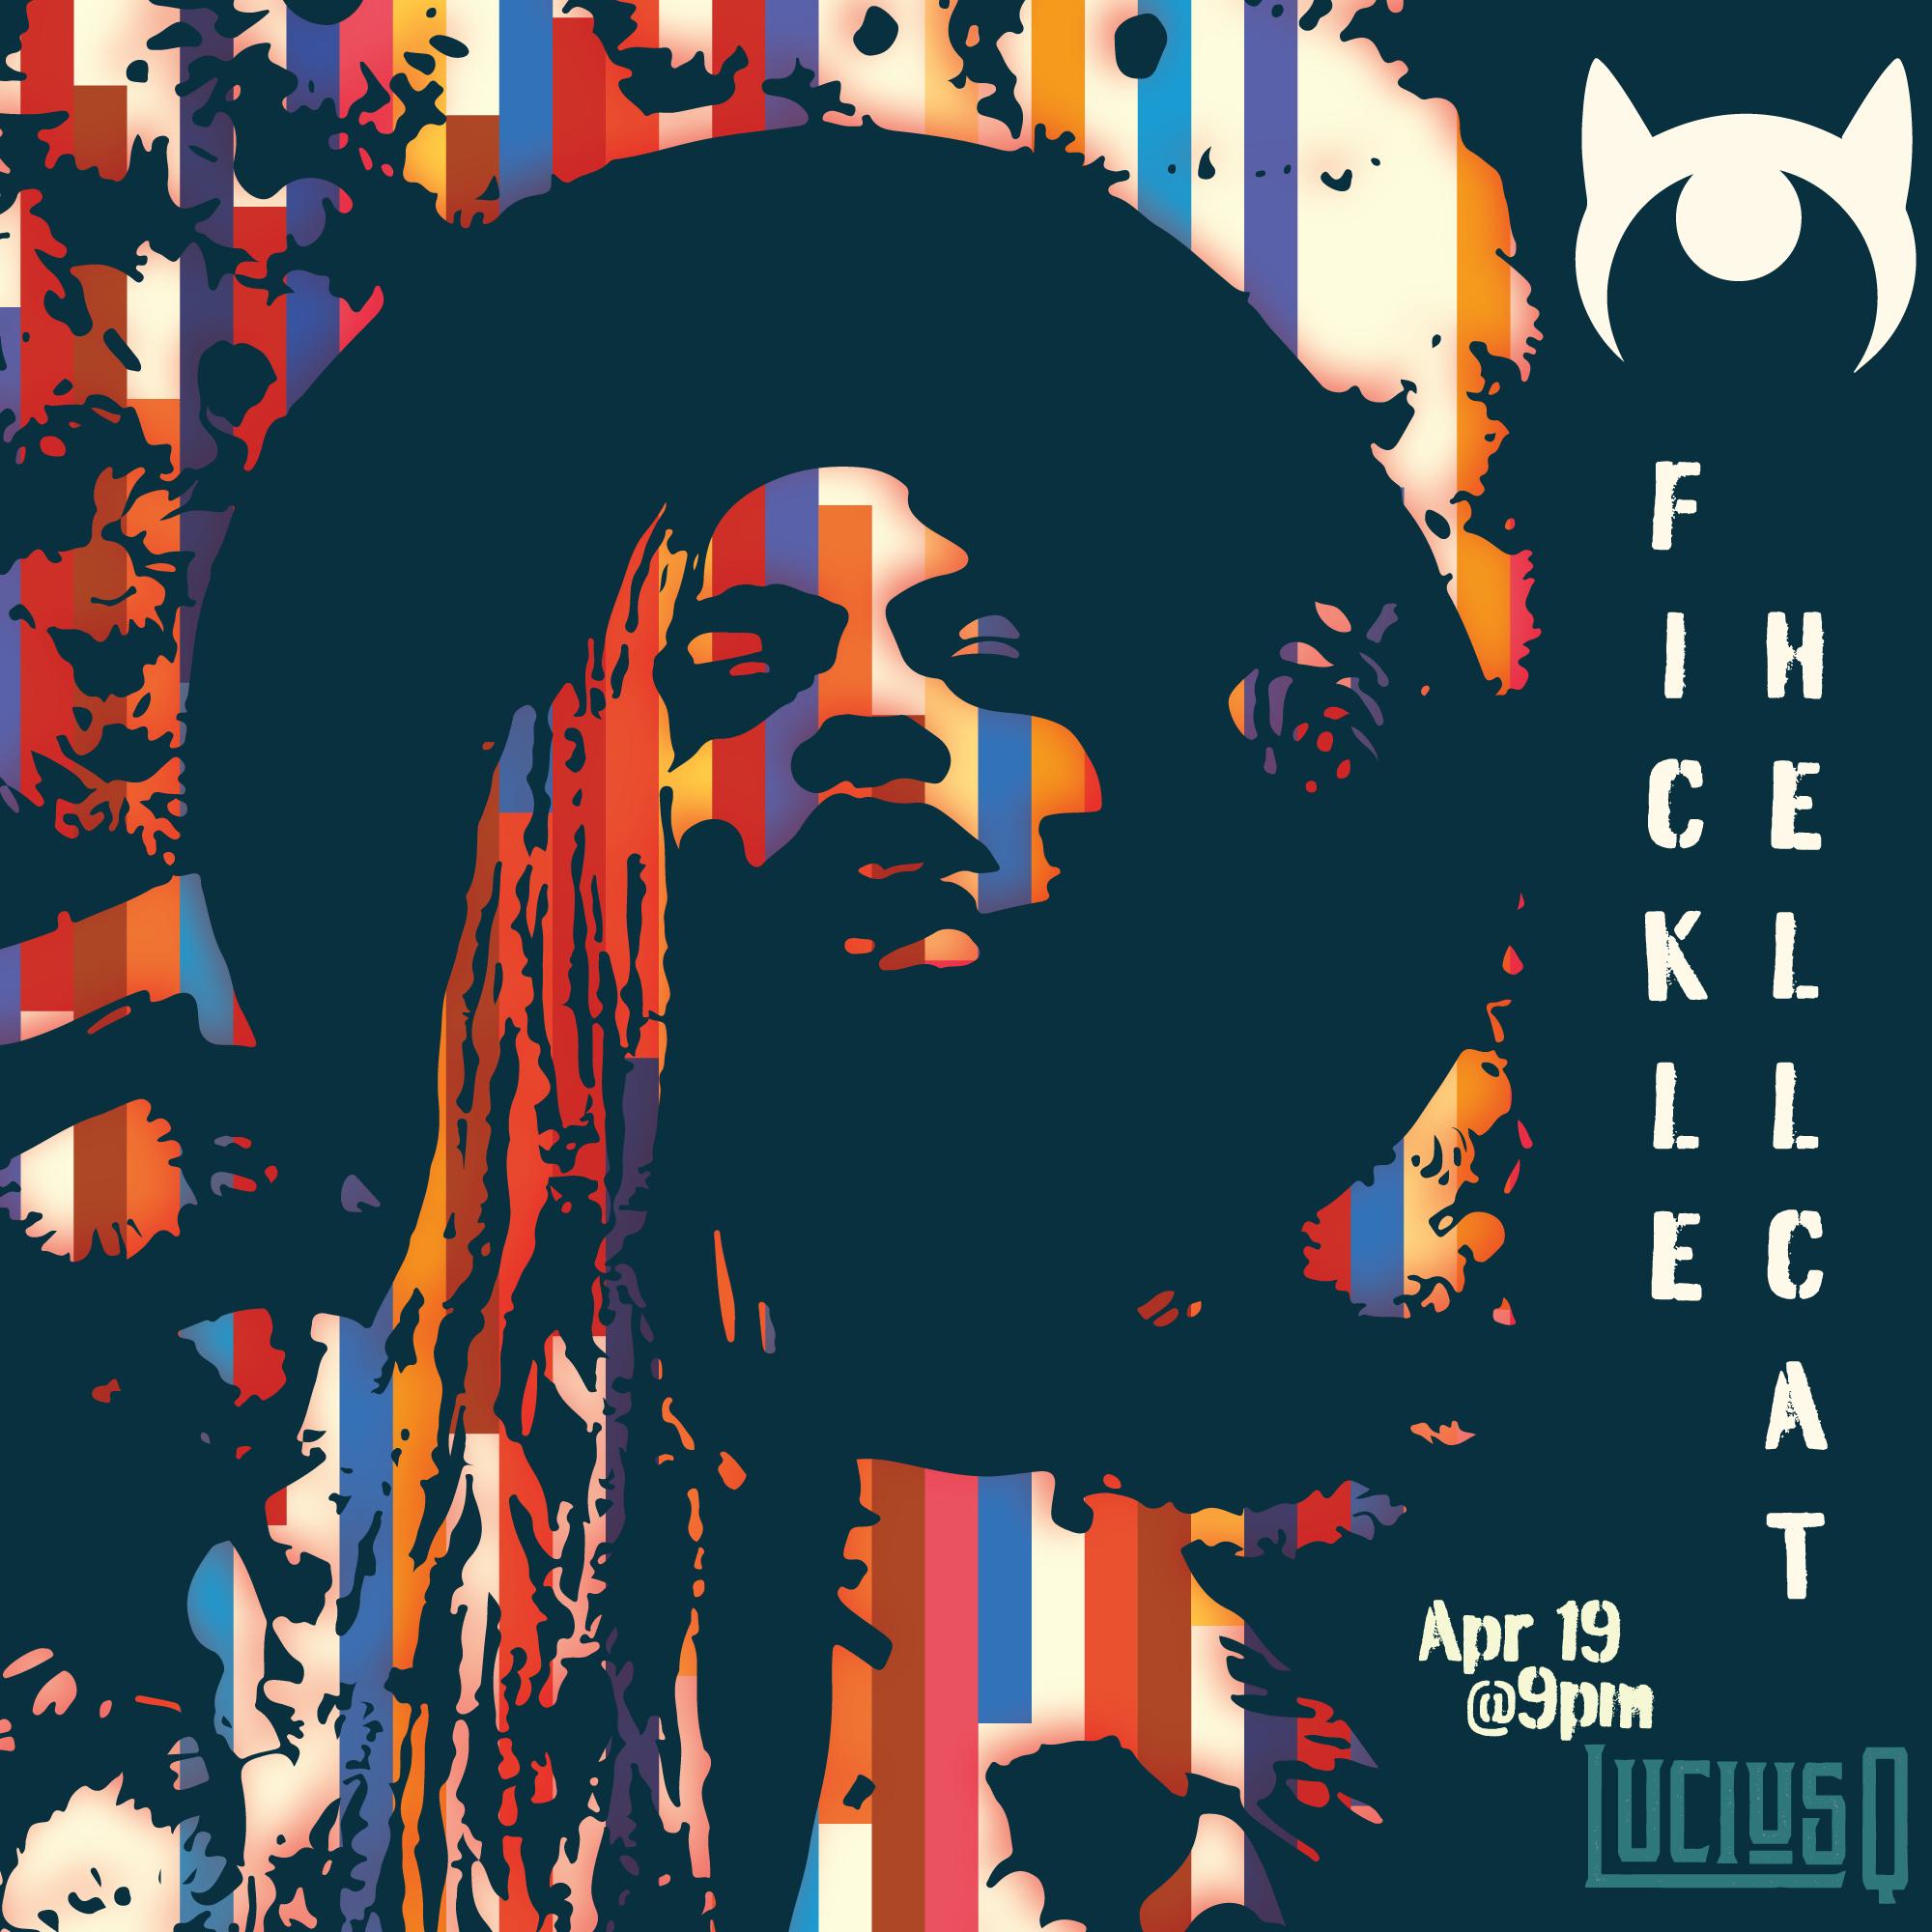 FiR-Creative---LuciusQ---FickleHellcat---Tiel.png